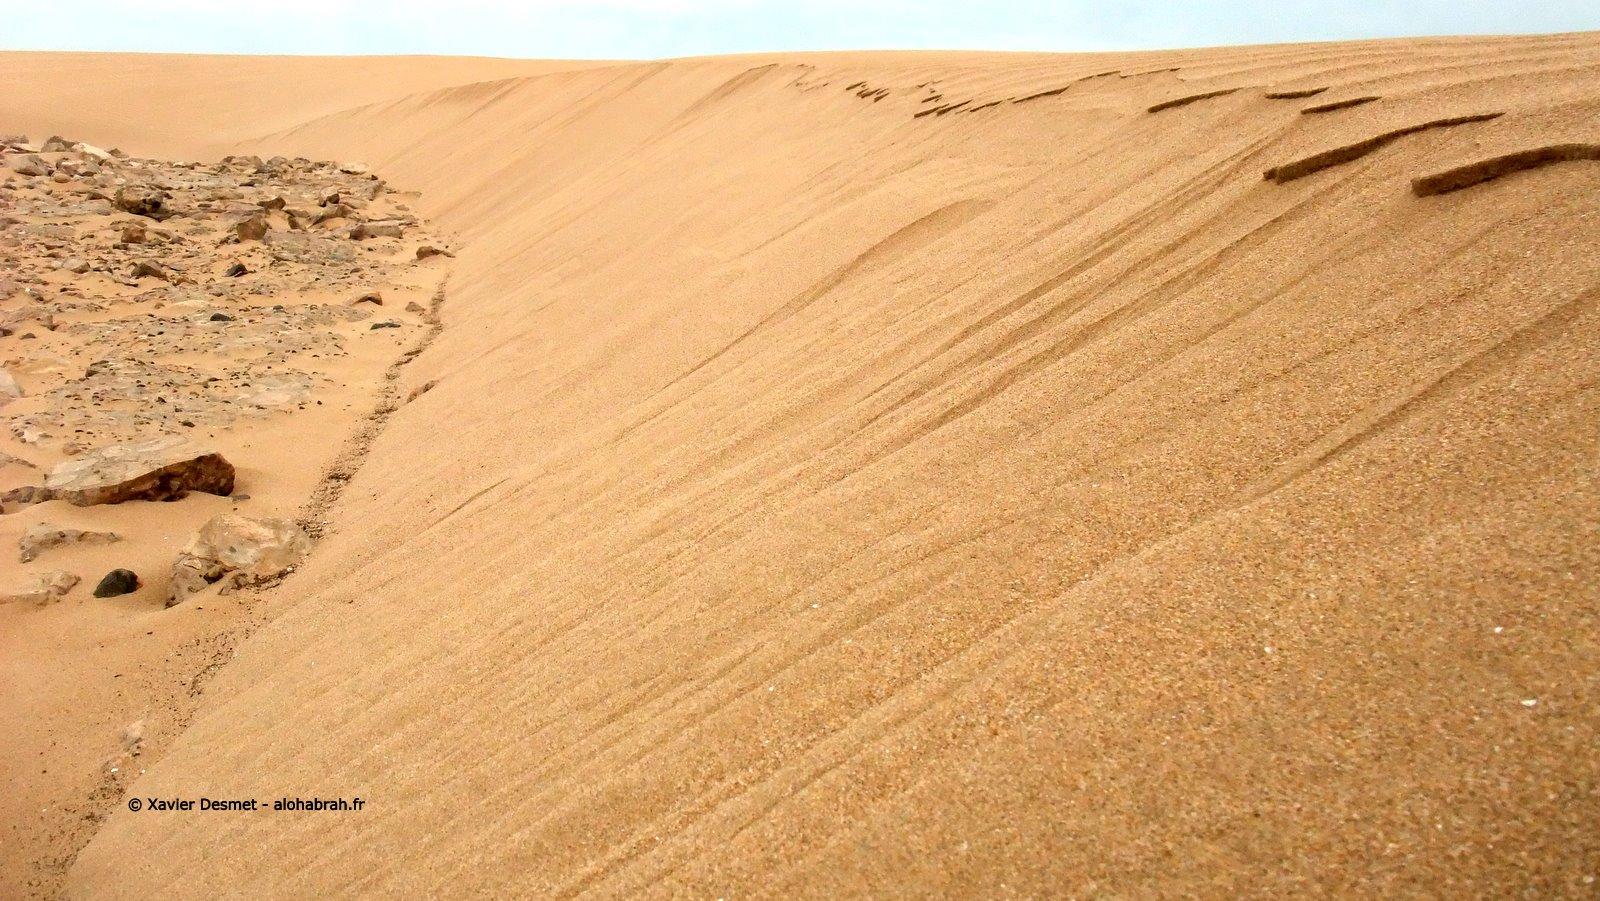 Dune Macro Effect © Xavier Desmet - alohabrah.fr